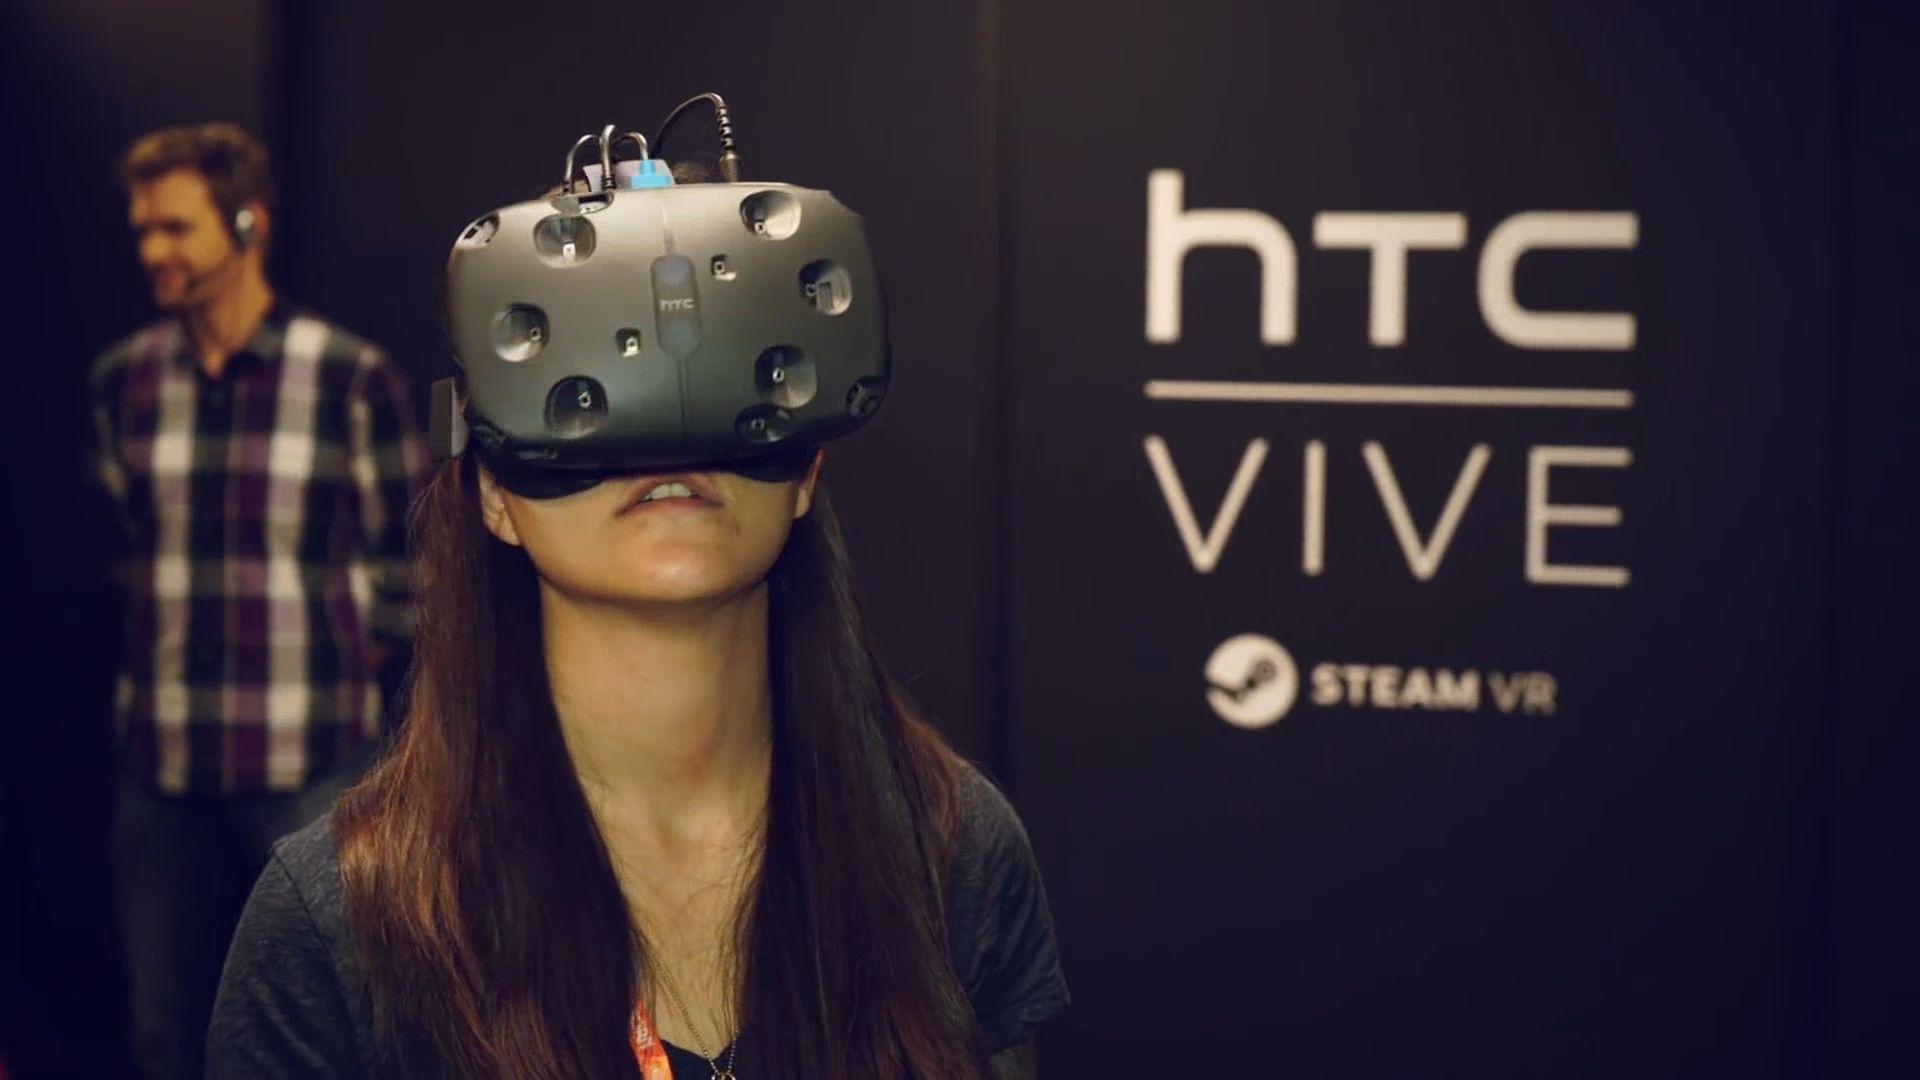 HTC的复兴困境,新业务为何难造未来?